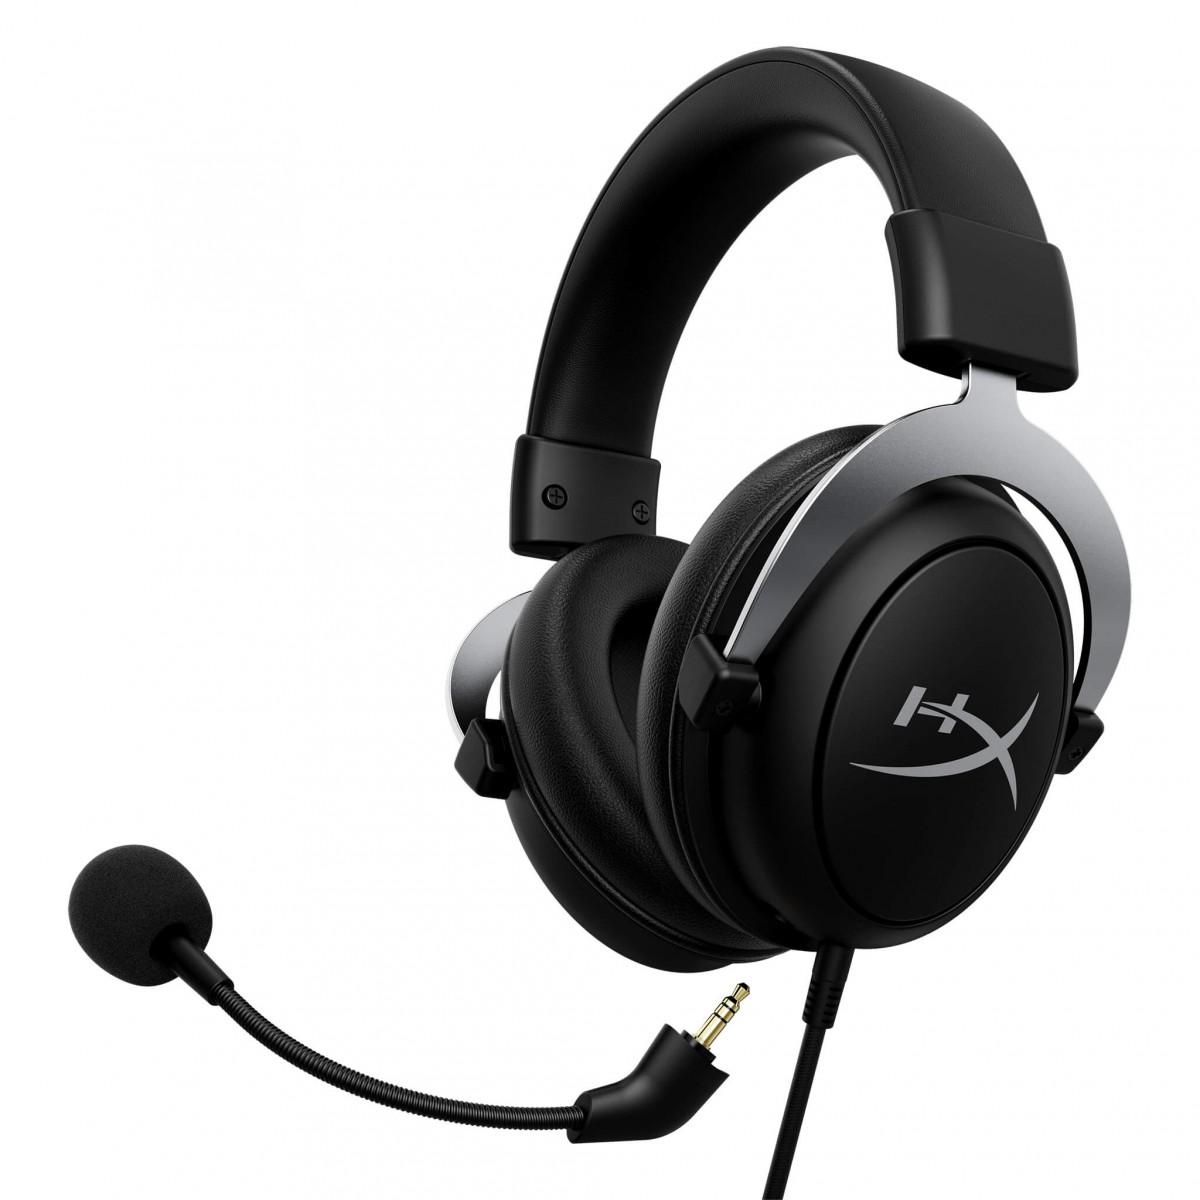 Headset Gamer HyperX CloudX, Xbox, Driver 53mm, 3.5mm, Black, HX-HS5CX-SR